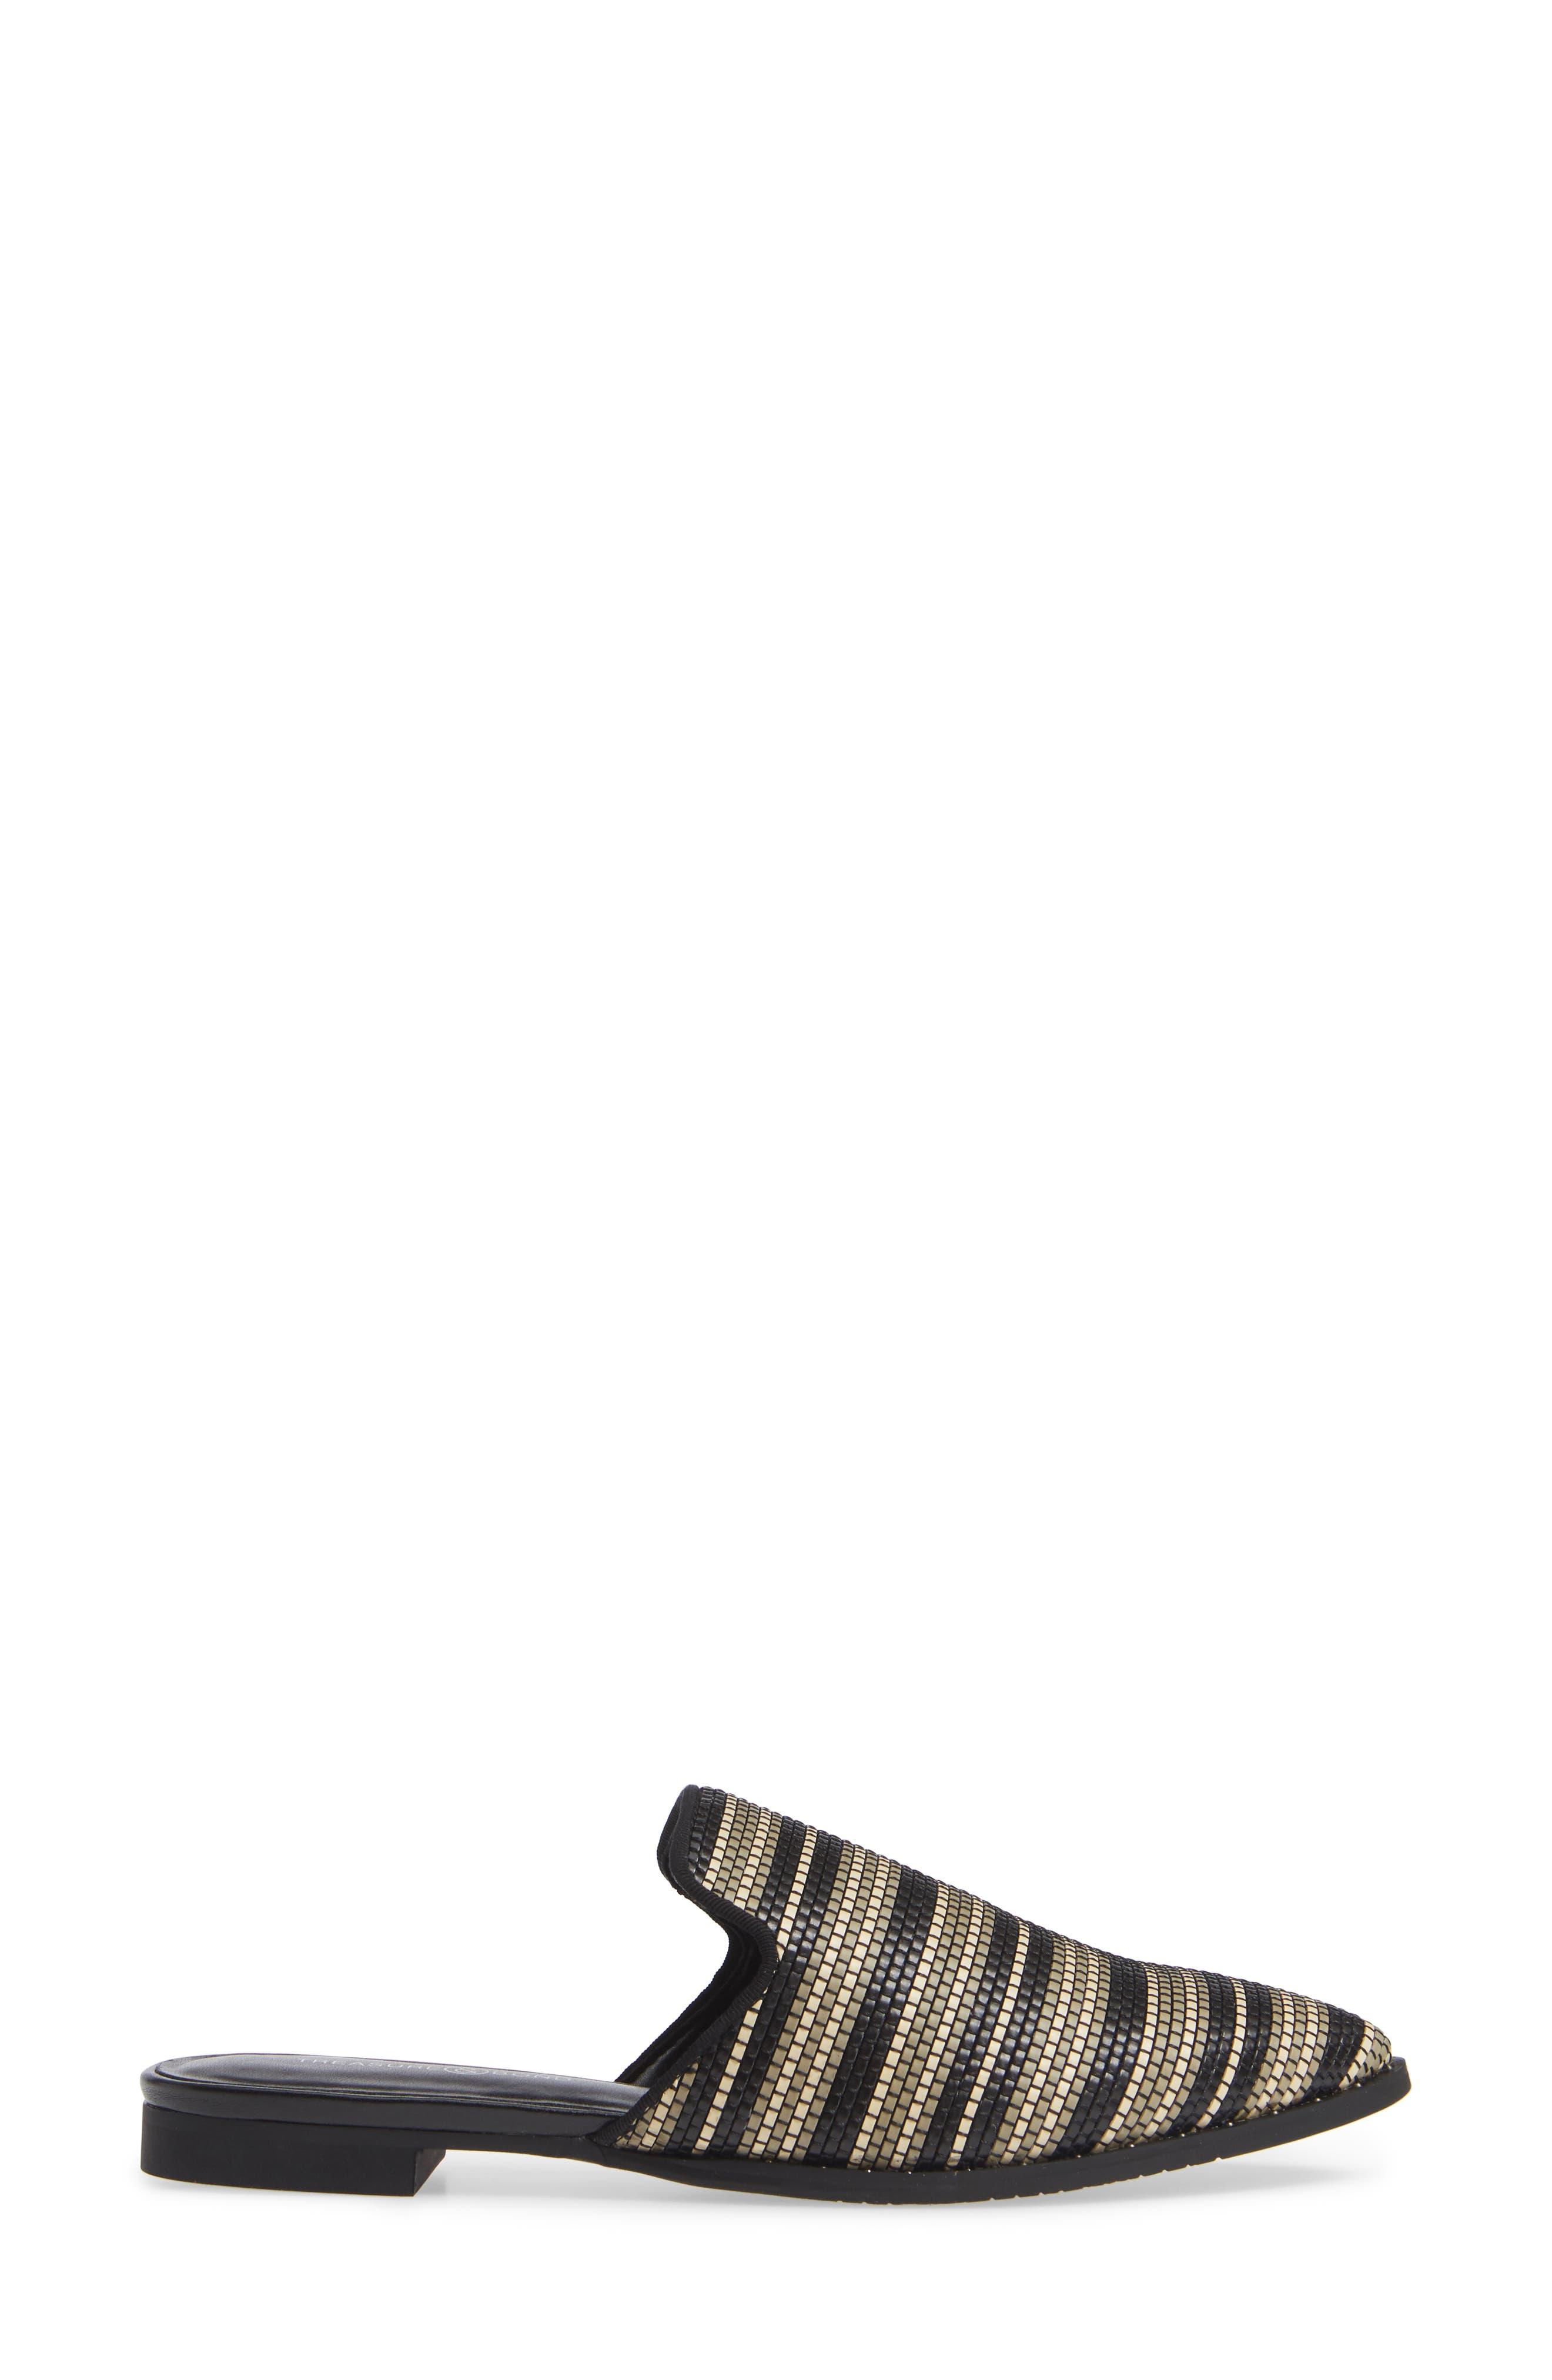 TREASURE & BOND,                             Keaton Loafer Mule,                             Alternate thumbnail 3, color,                             004